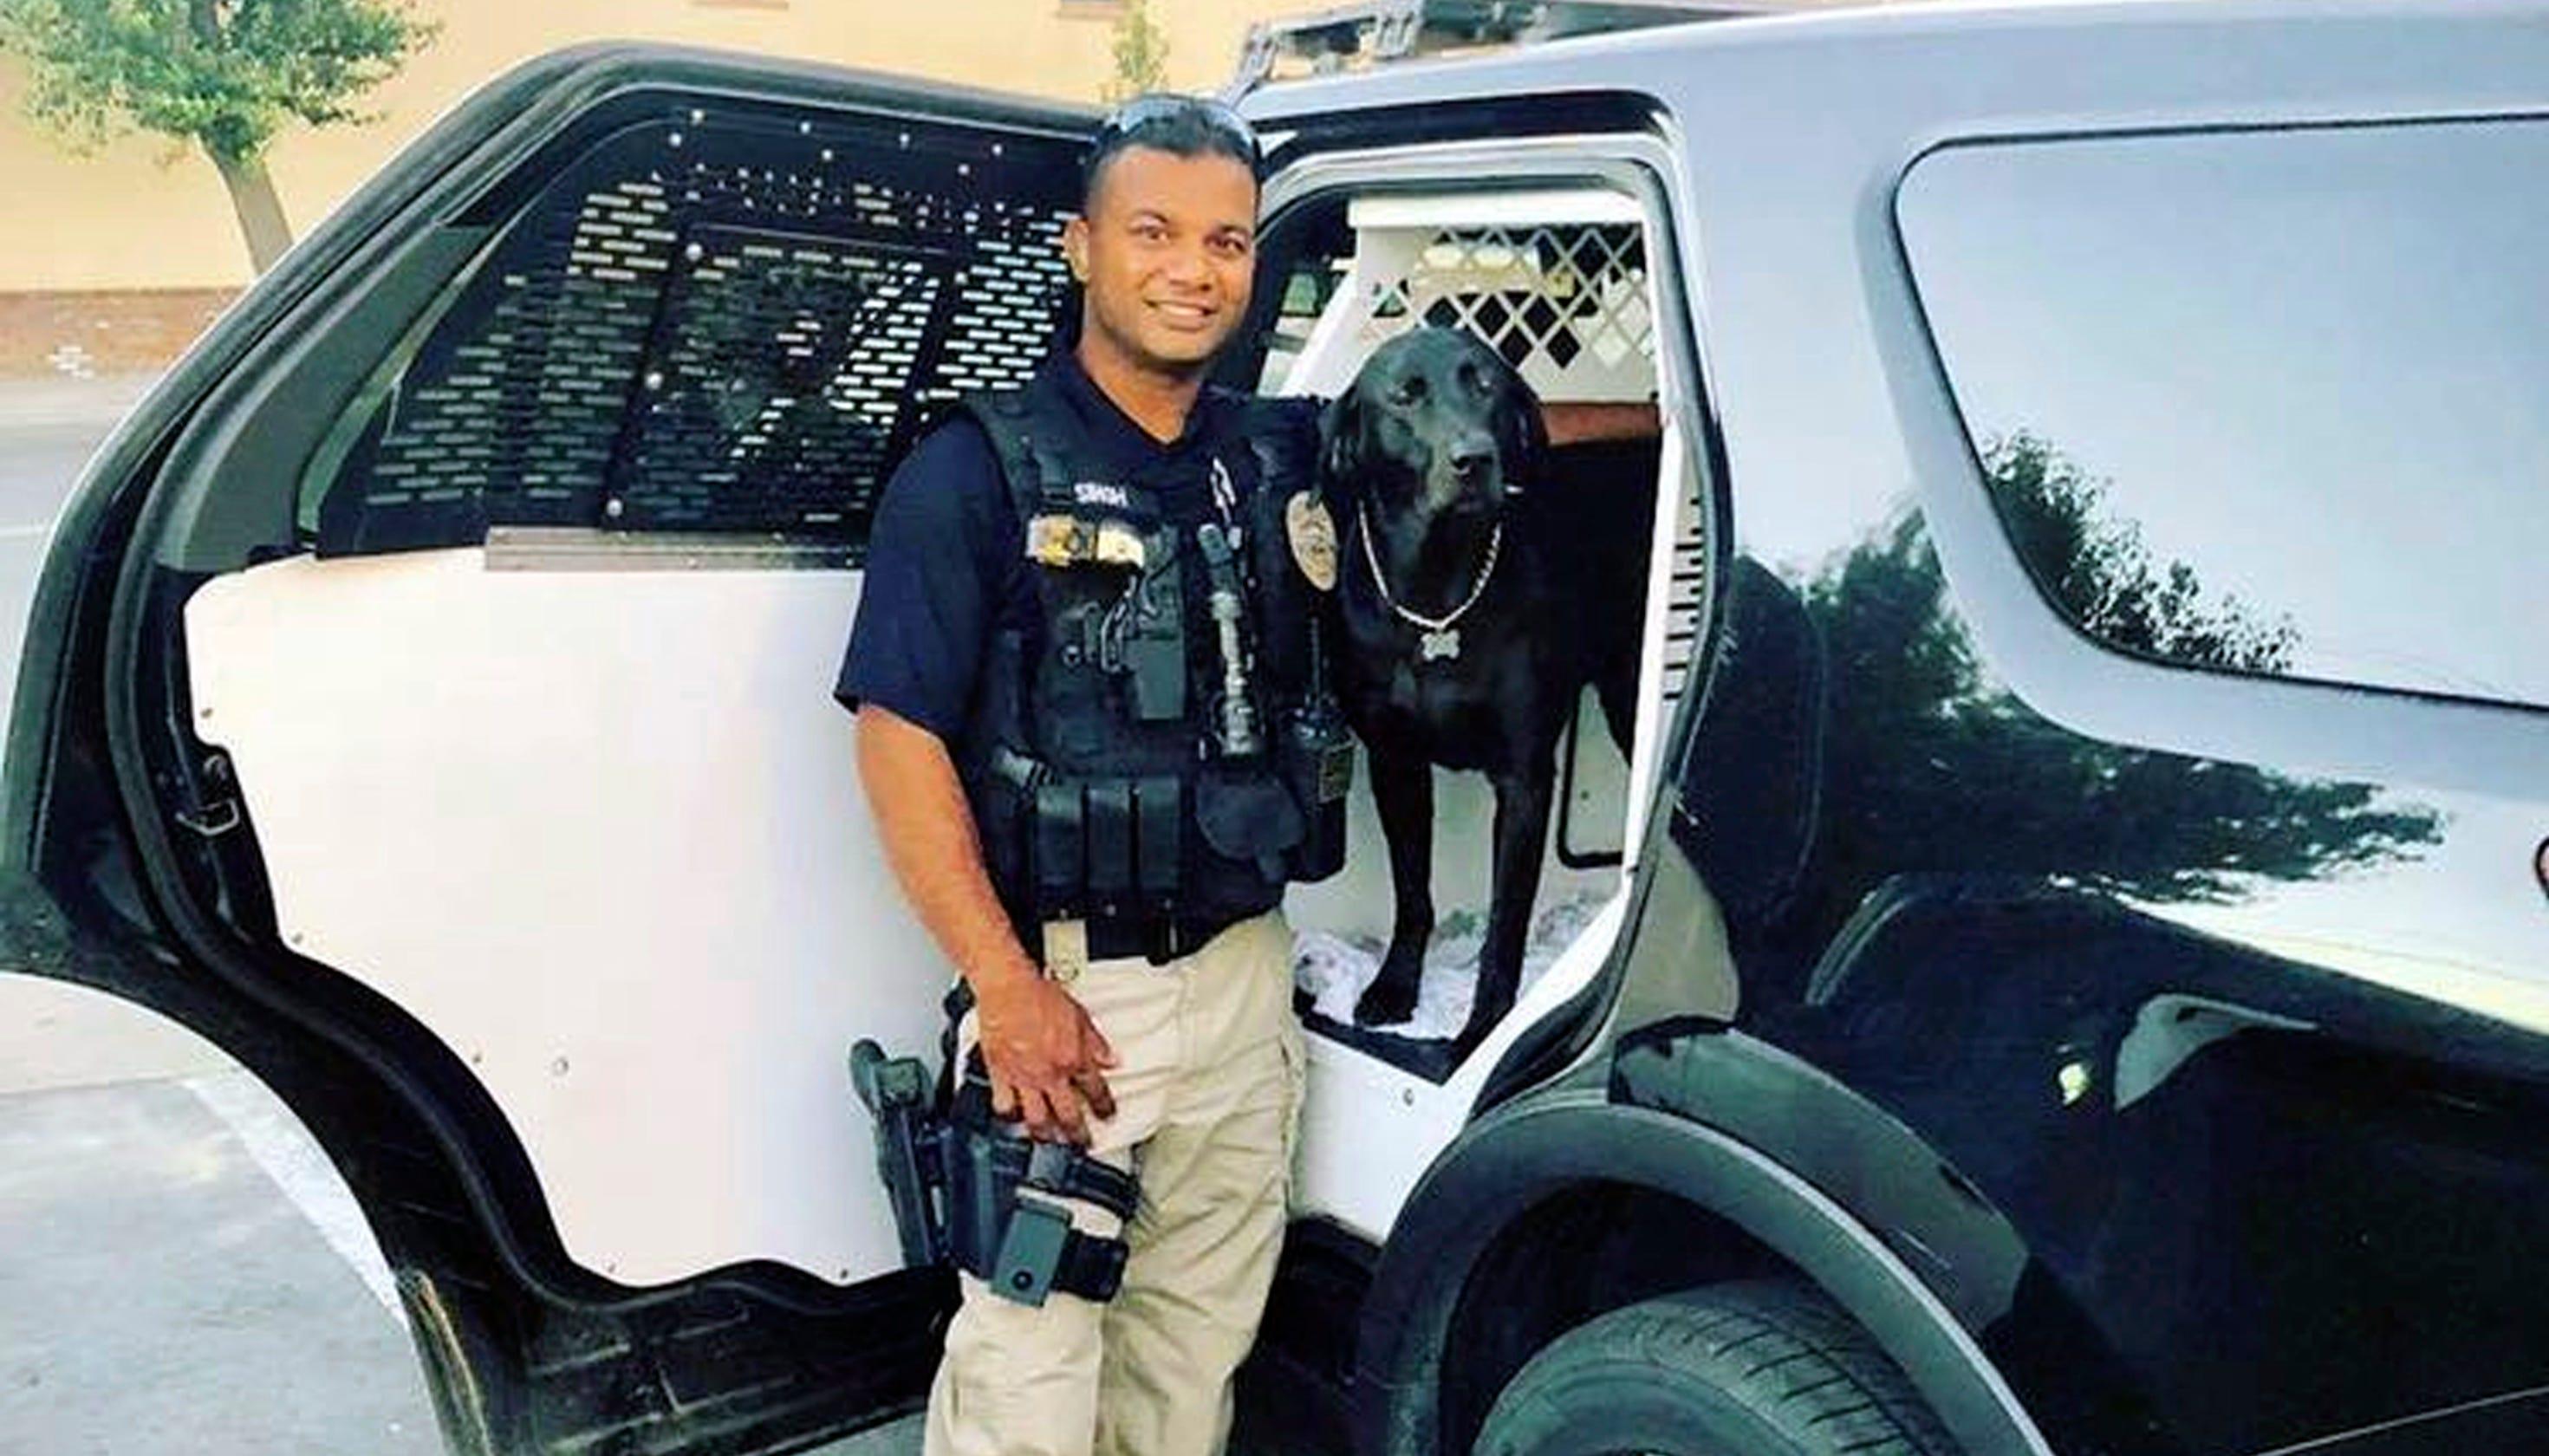 California 39 cop killer 39 is captured taken into custody - Police officer in california ...